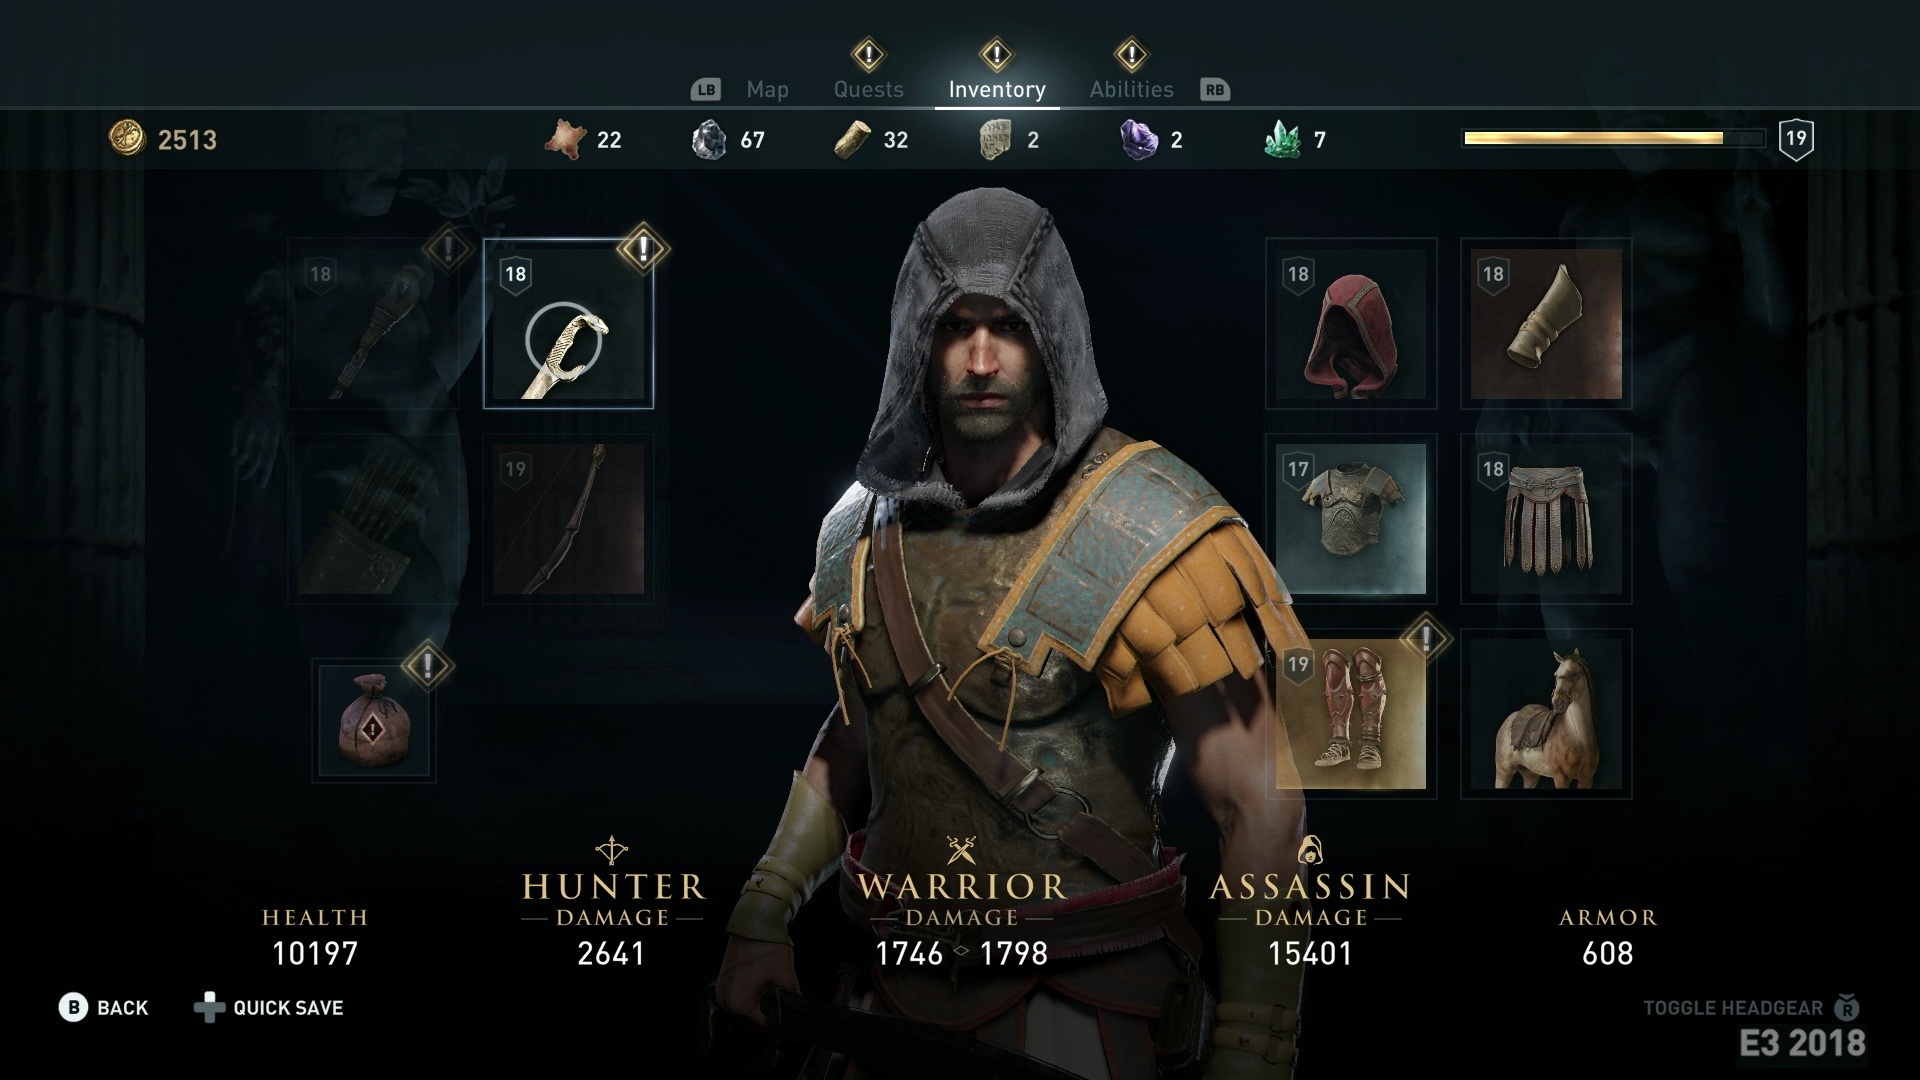 Assassin's Creed Odyssey Screenshots Leak Mspoweruser